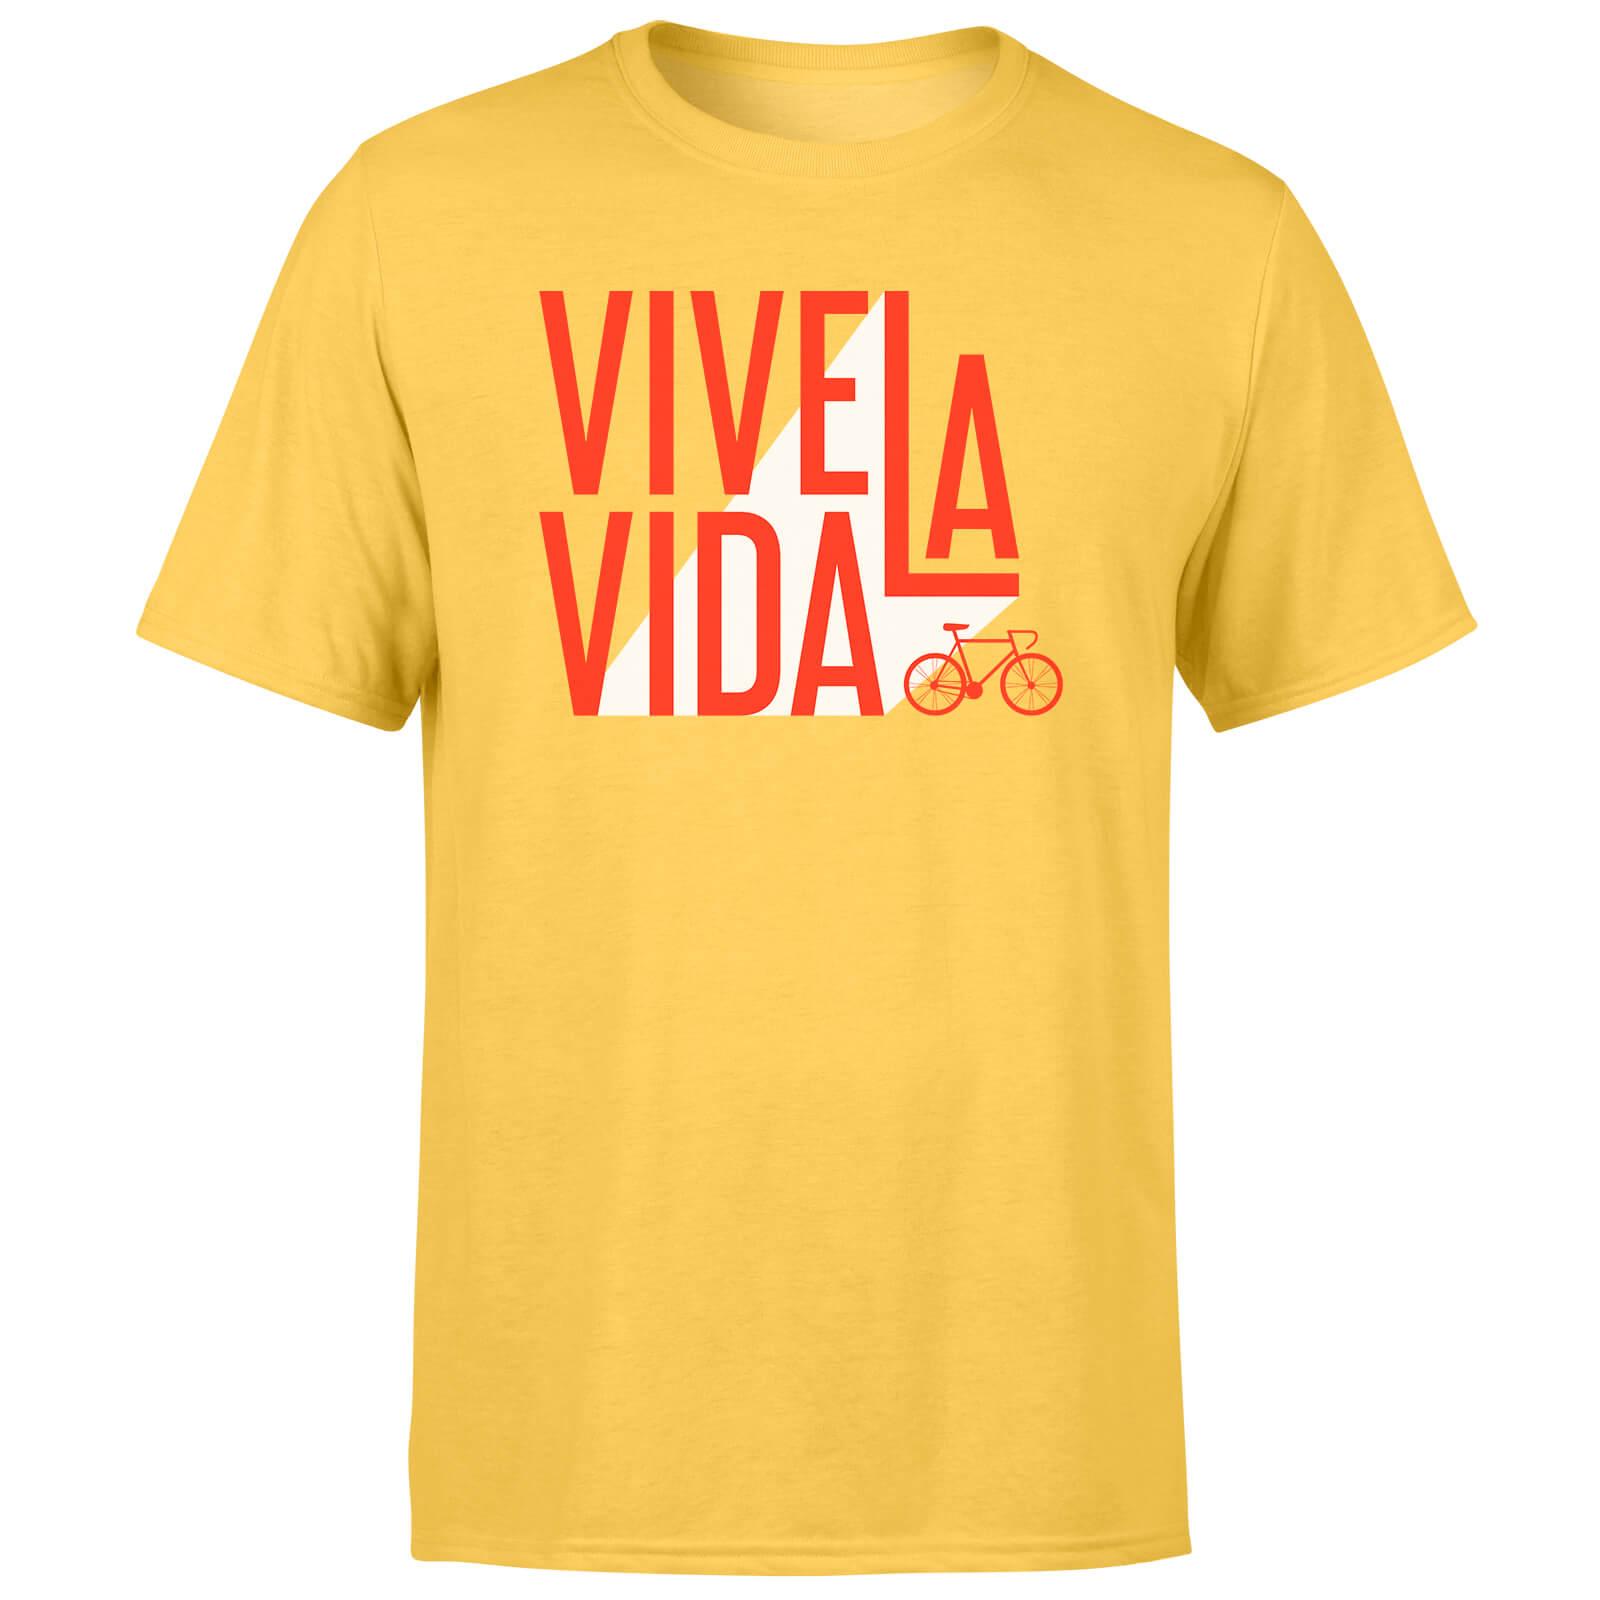 Vive La Vida Men's Yellow T-Shirt - S - Gelb